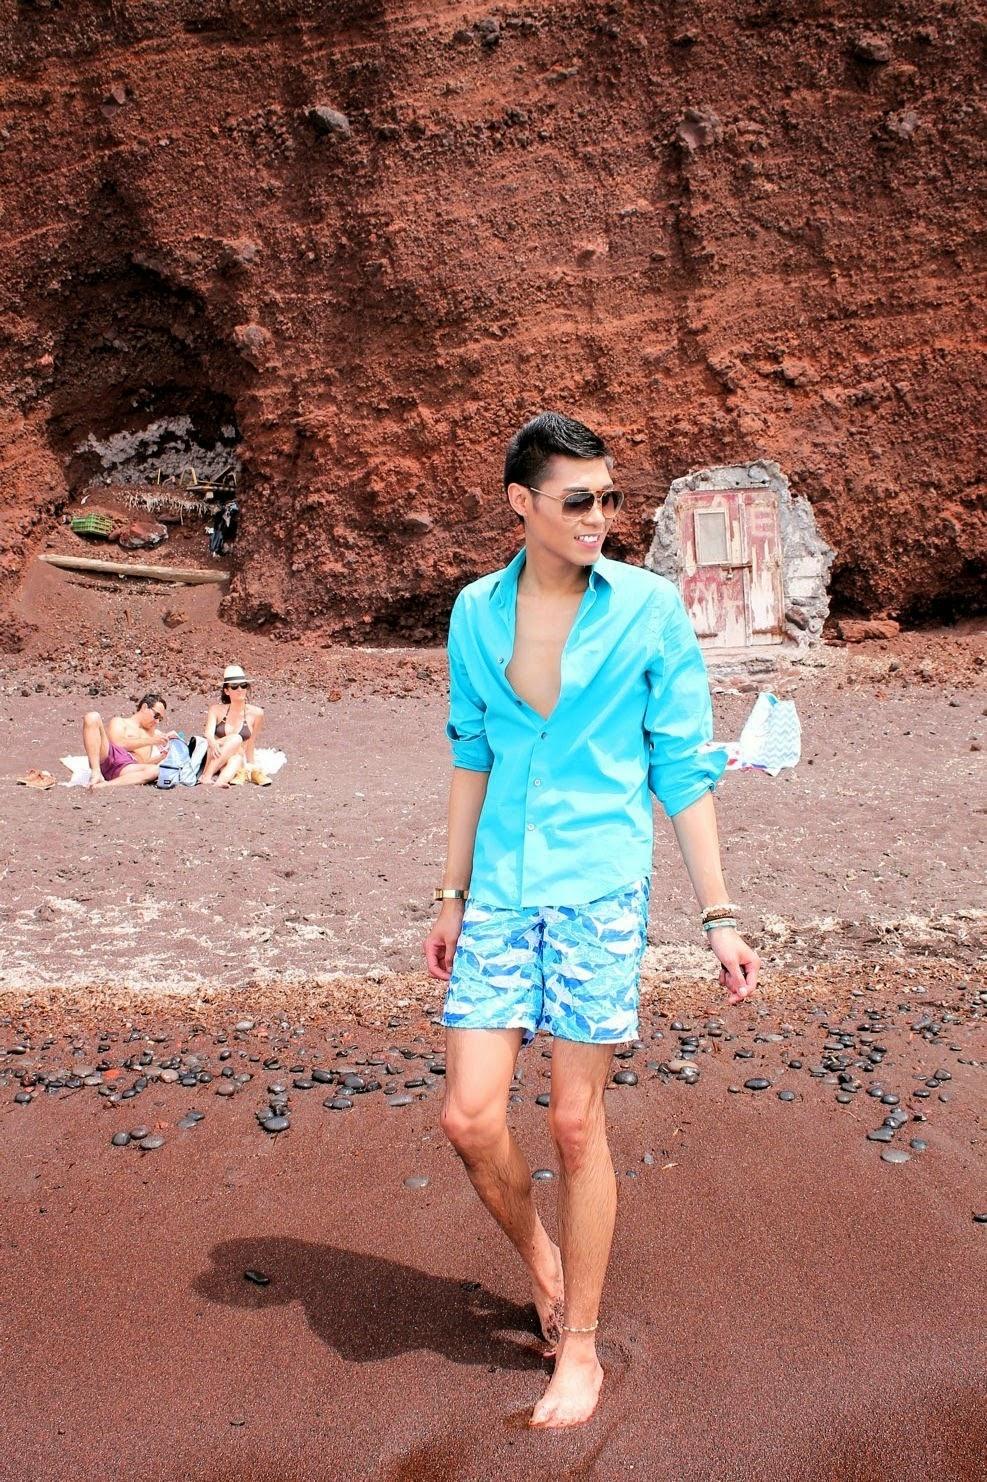 http://ziondejano.blogspot.com/2014/04/red-beach-santorini.html